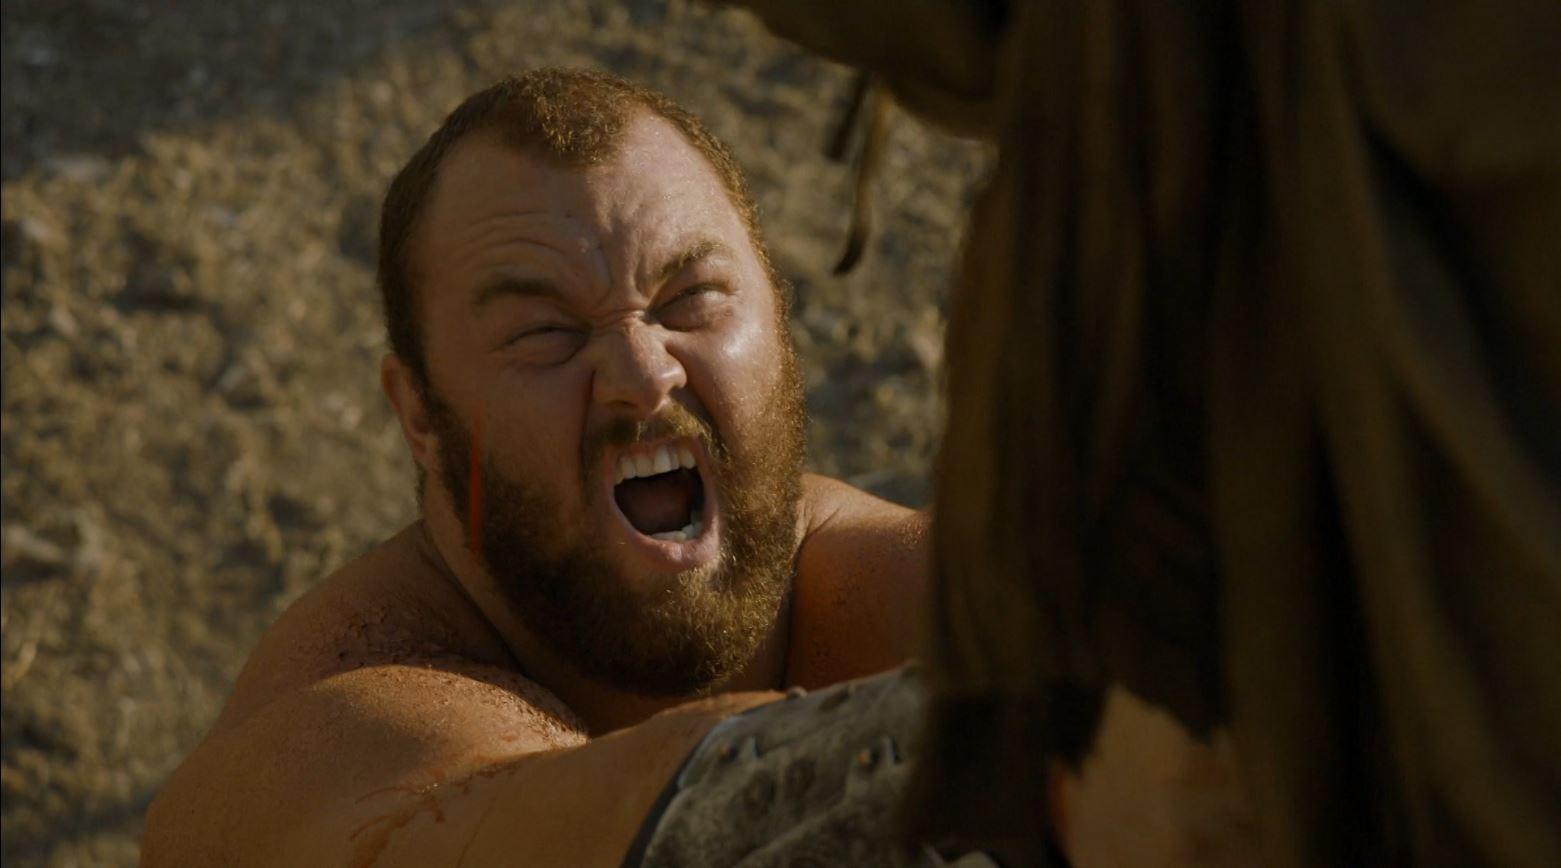 Game Of Thrones S4Ep7 Mockingbird Review - Hafþór Júlíus Björnsson as The Mountain (Clegane)